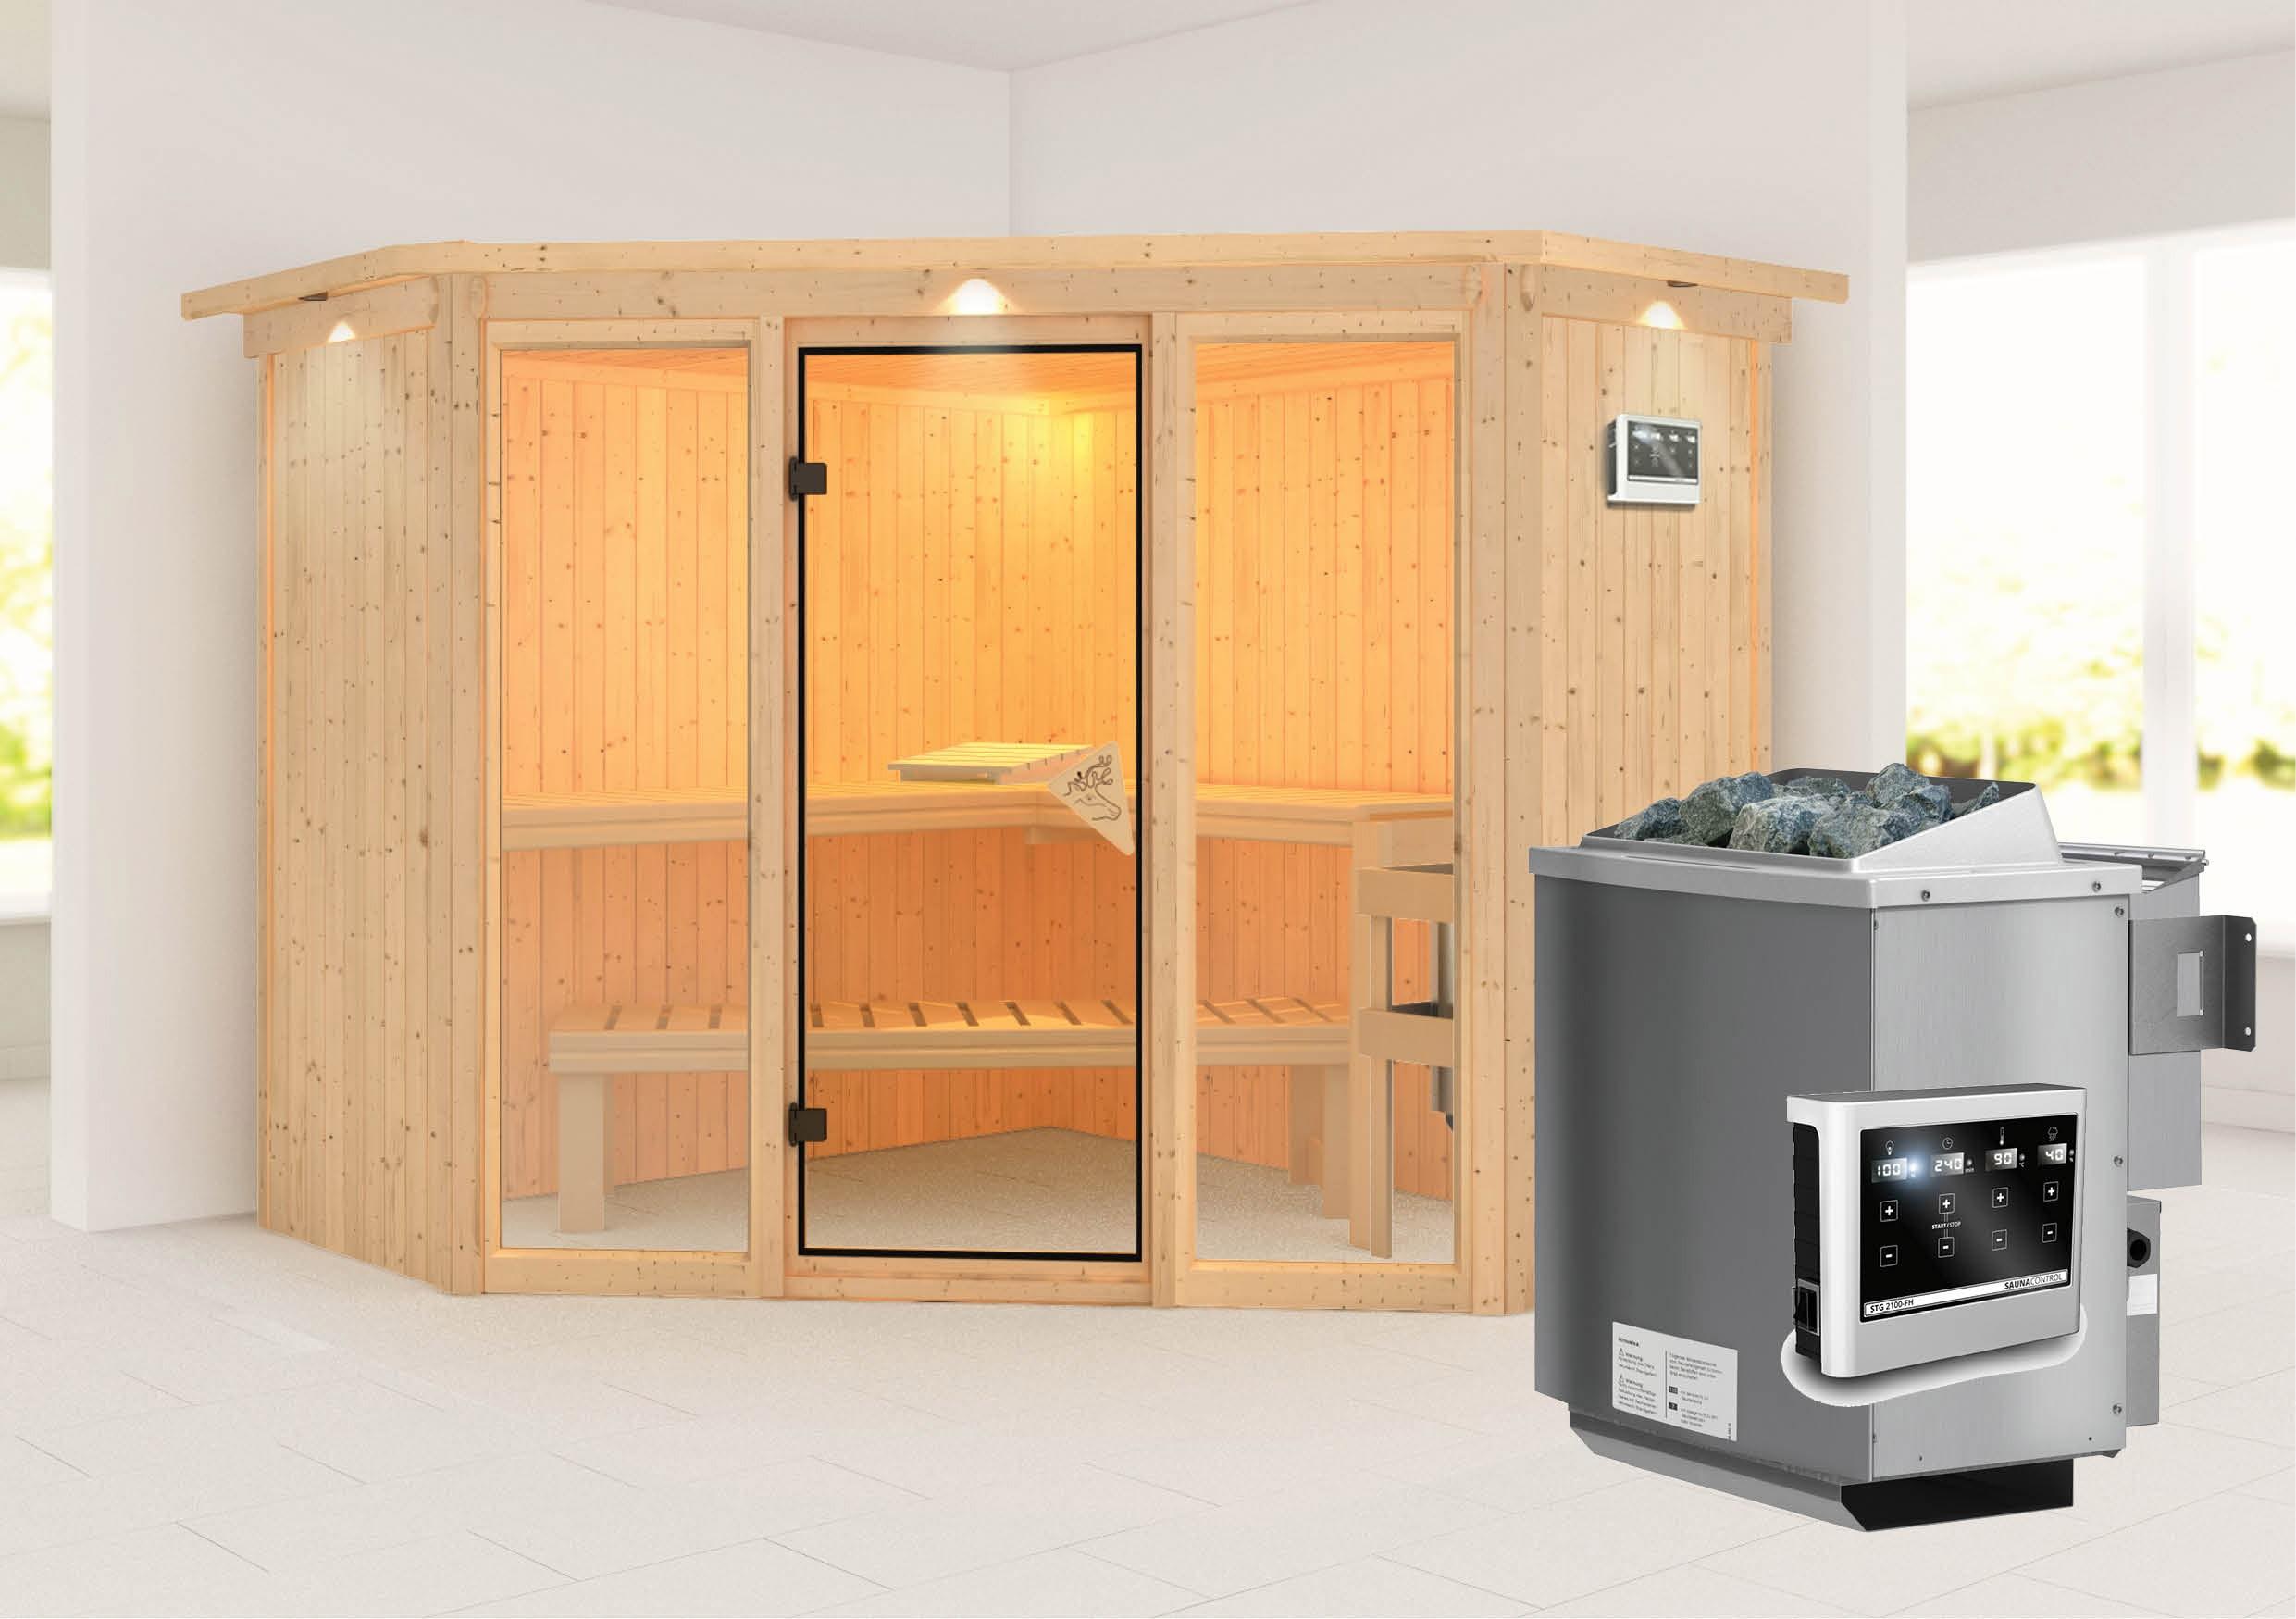 Karibu Sauna Flora 2 68mm Dachkranz + Bio Ofen 9kW extern classic Tür Bild 1